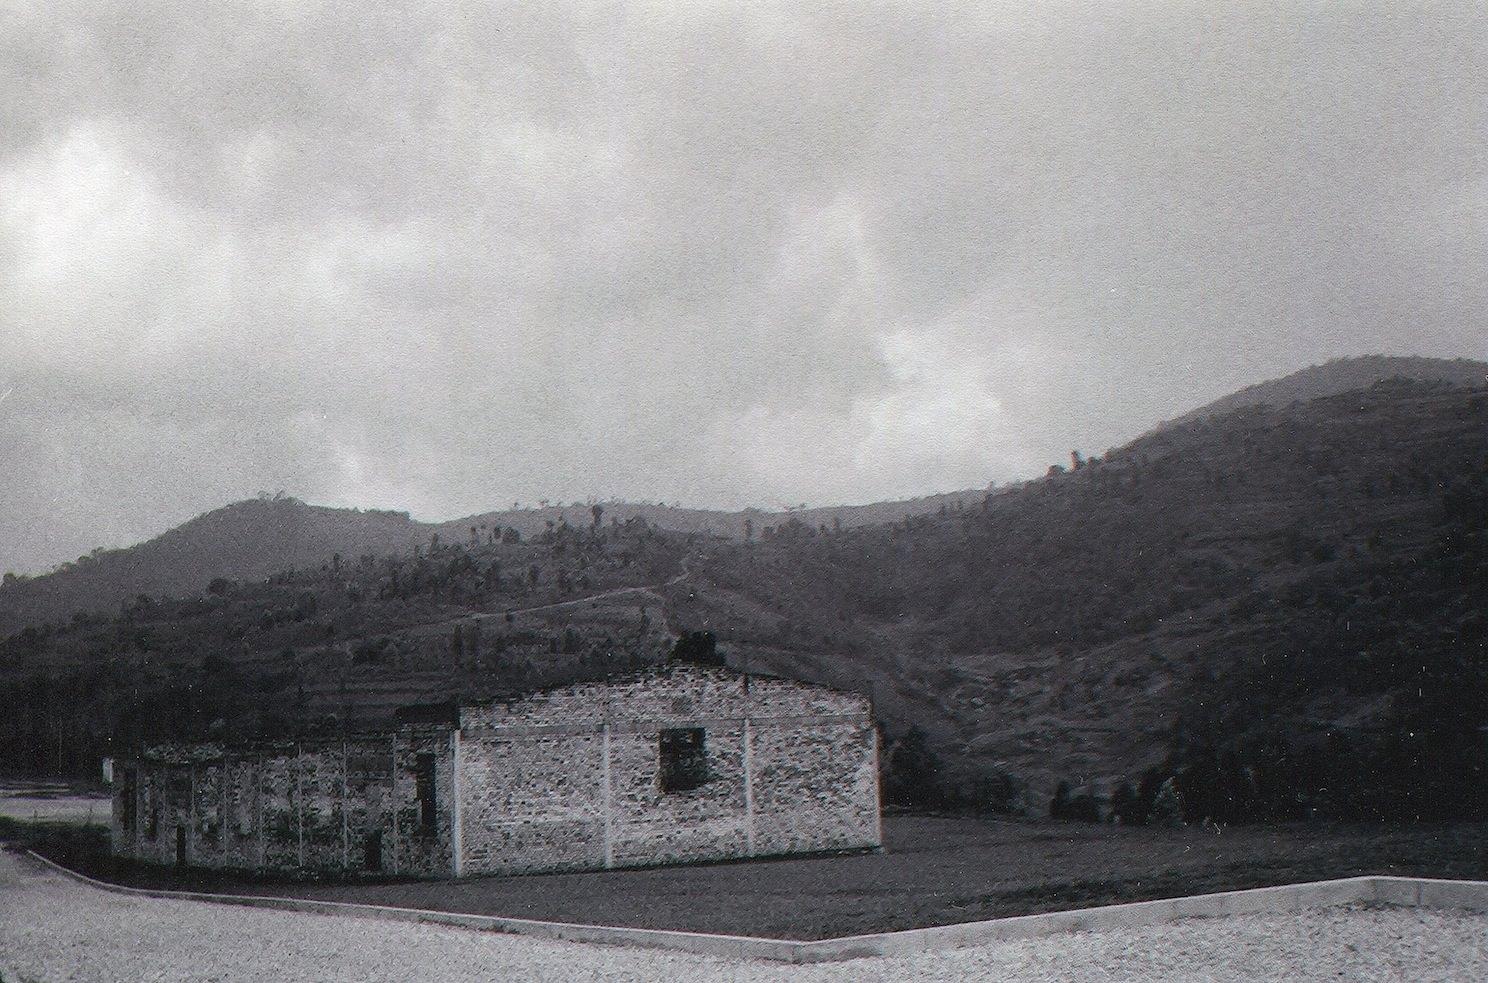 School on a hillside in Murambi, Gikongoro province, Rwanda. Site of a Tutsi massacre in 1994.